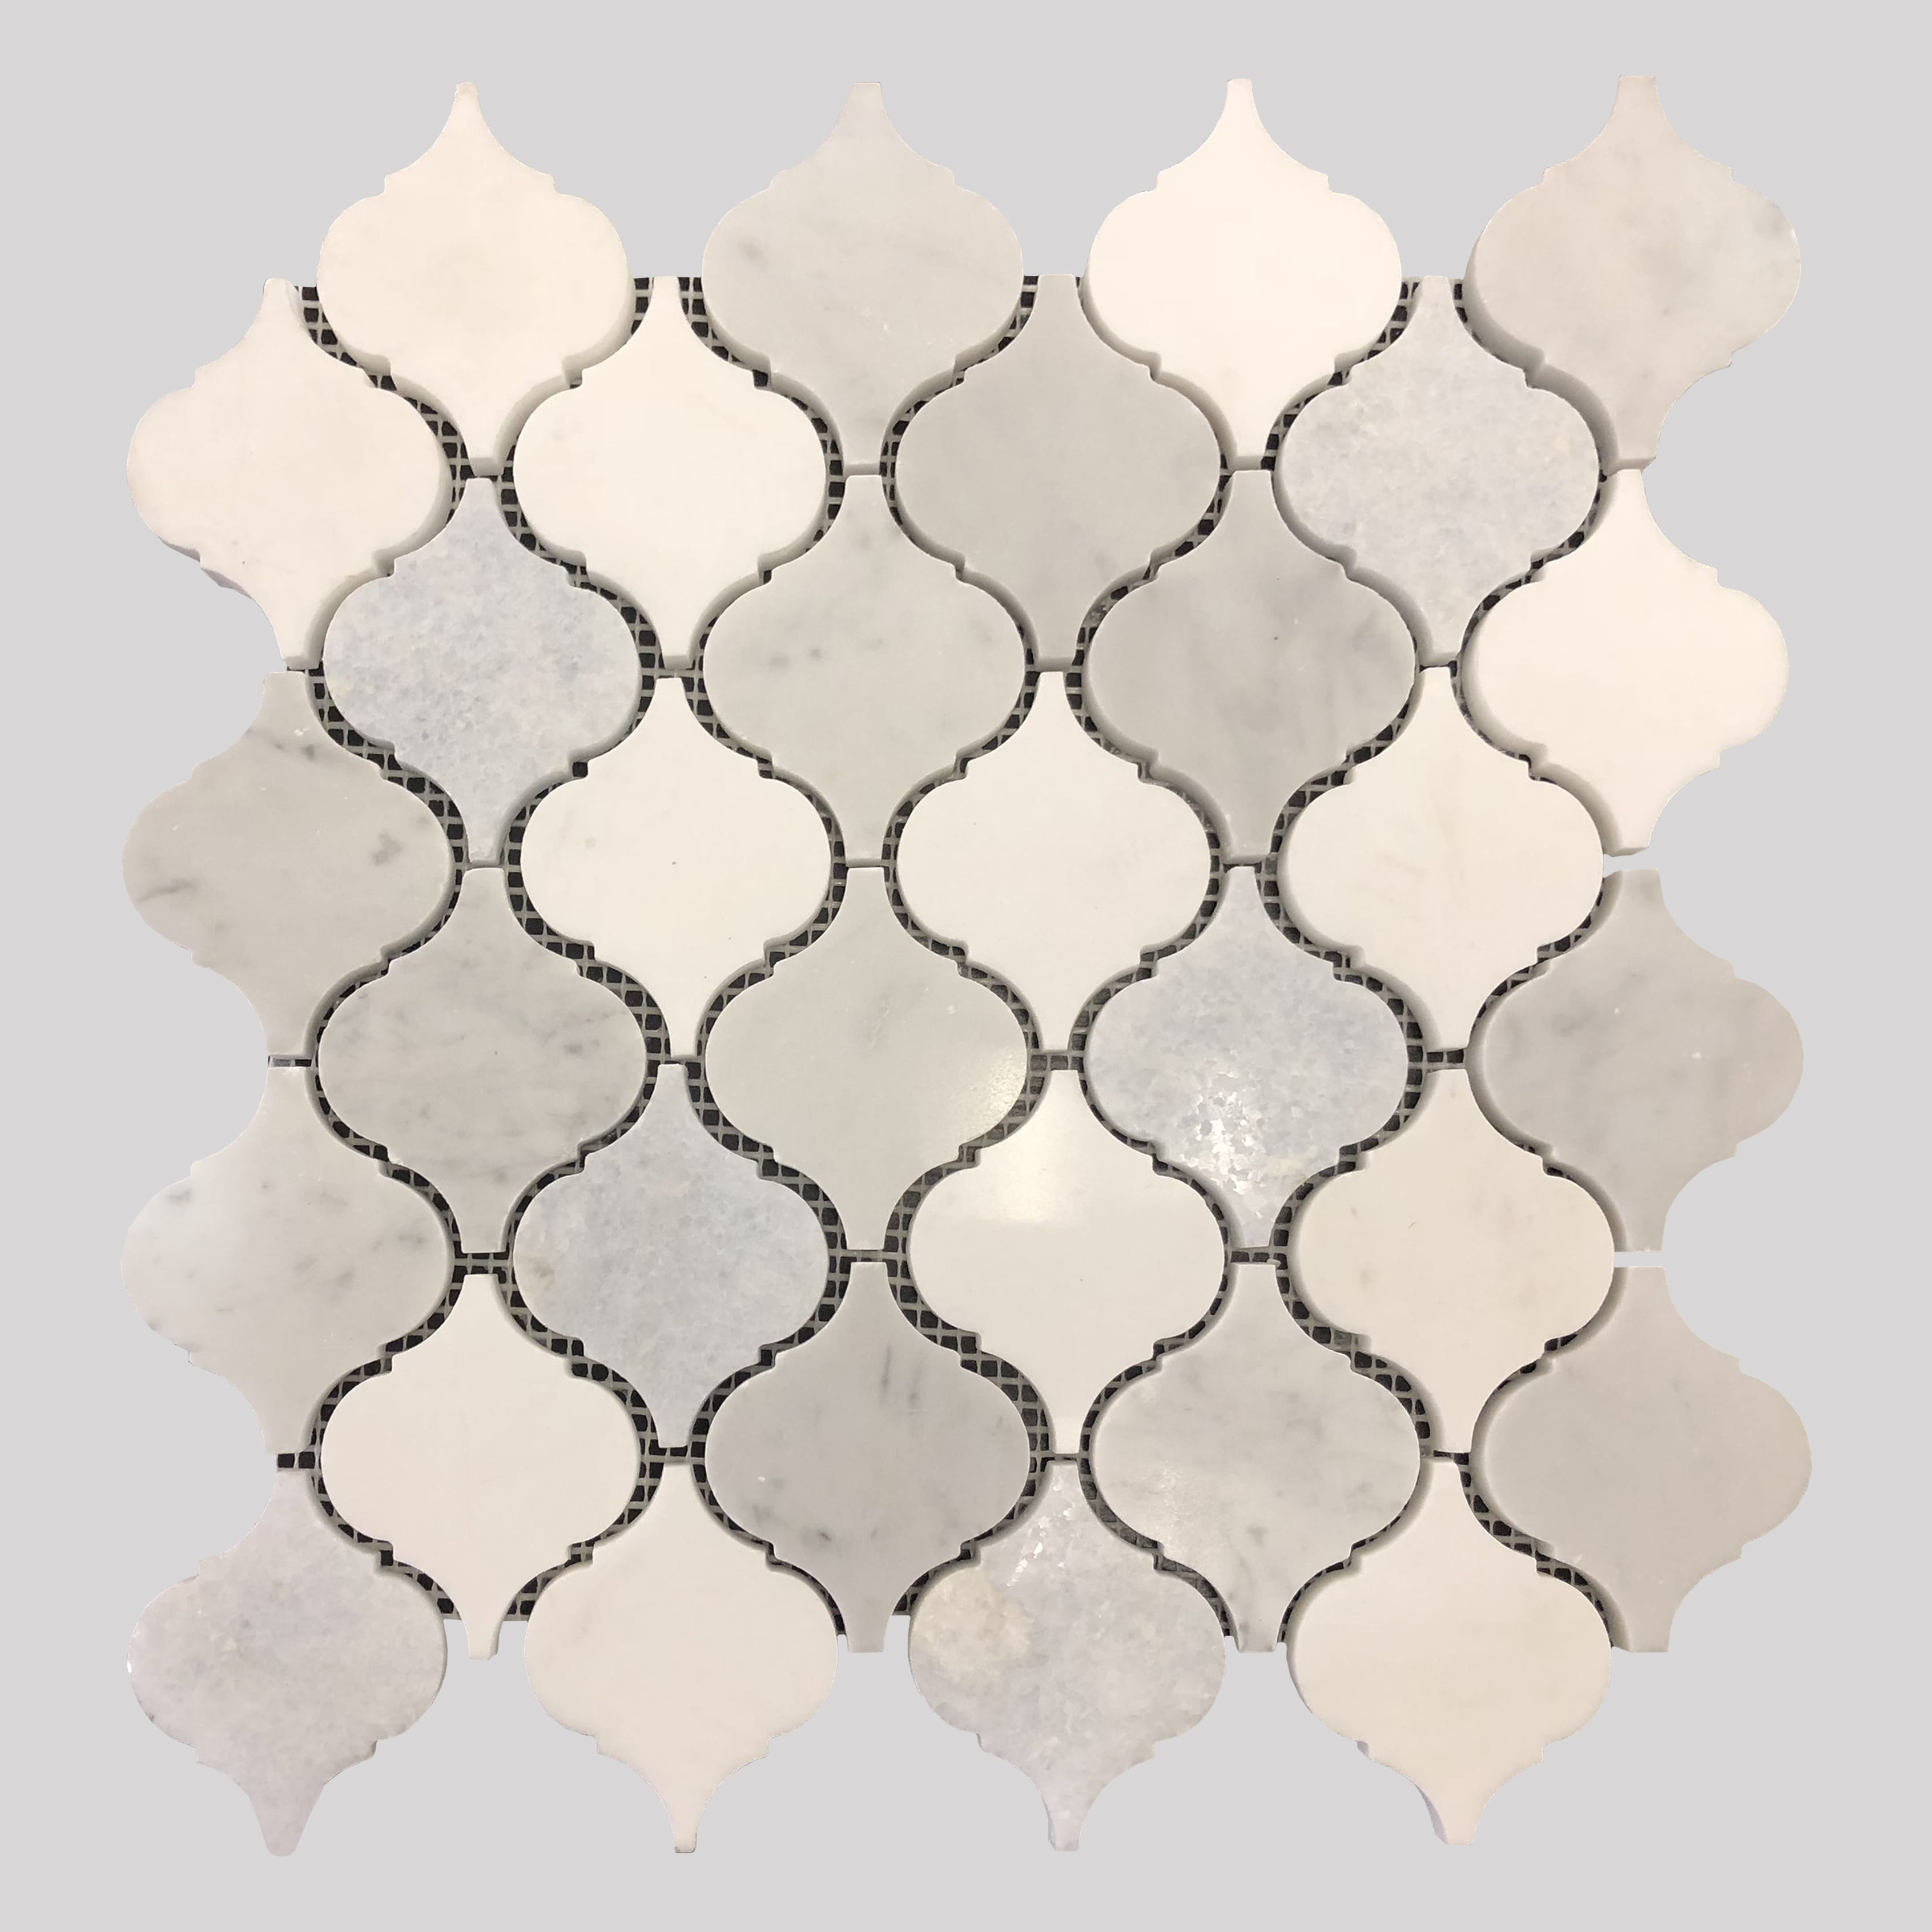 Tarmak-Usa-Stone-Collection-Arabesque-Bianco-Carrara-Bianco-Dolomite-Blue Celeste-min